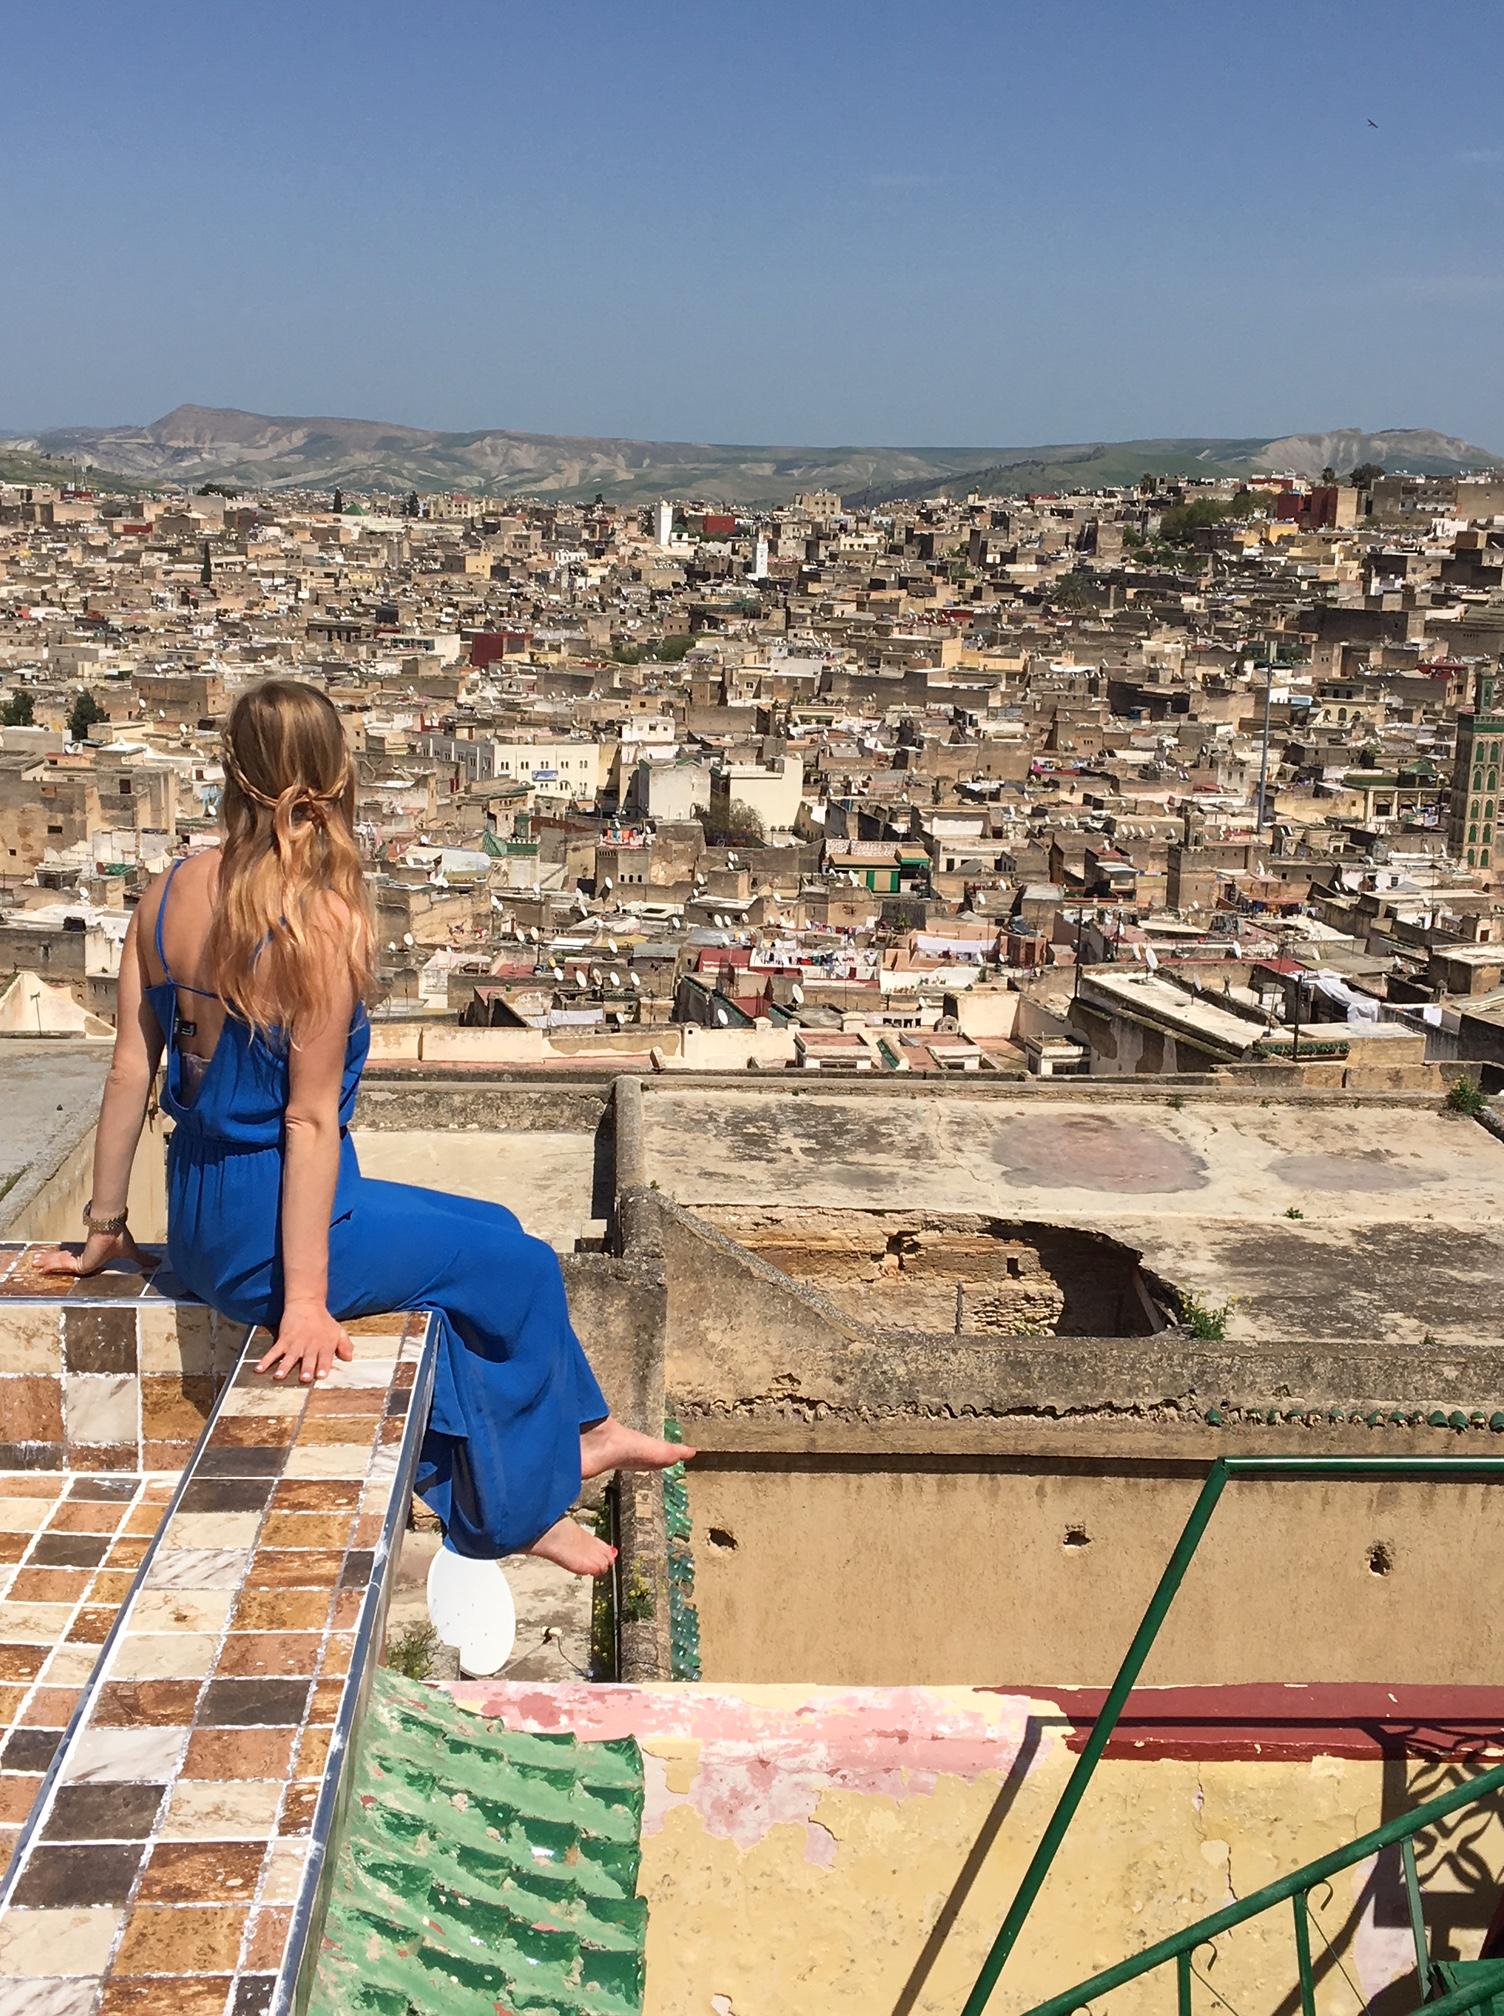 morocco travel   lifehacked1st com